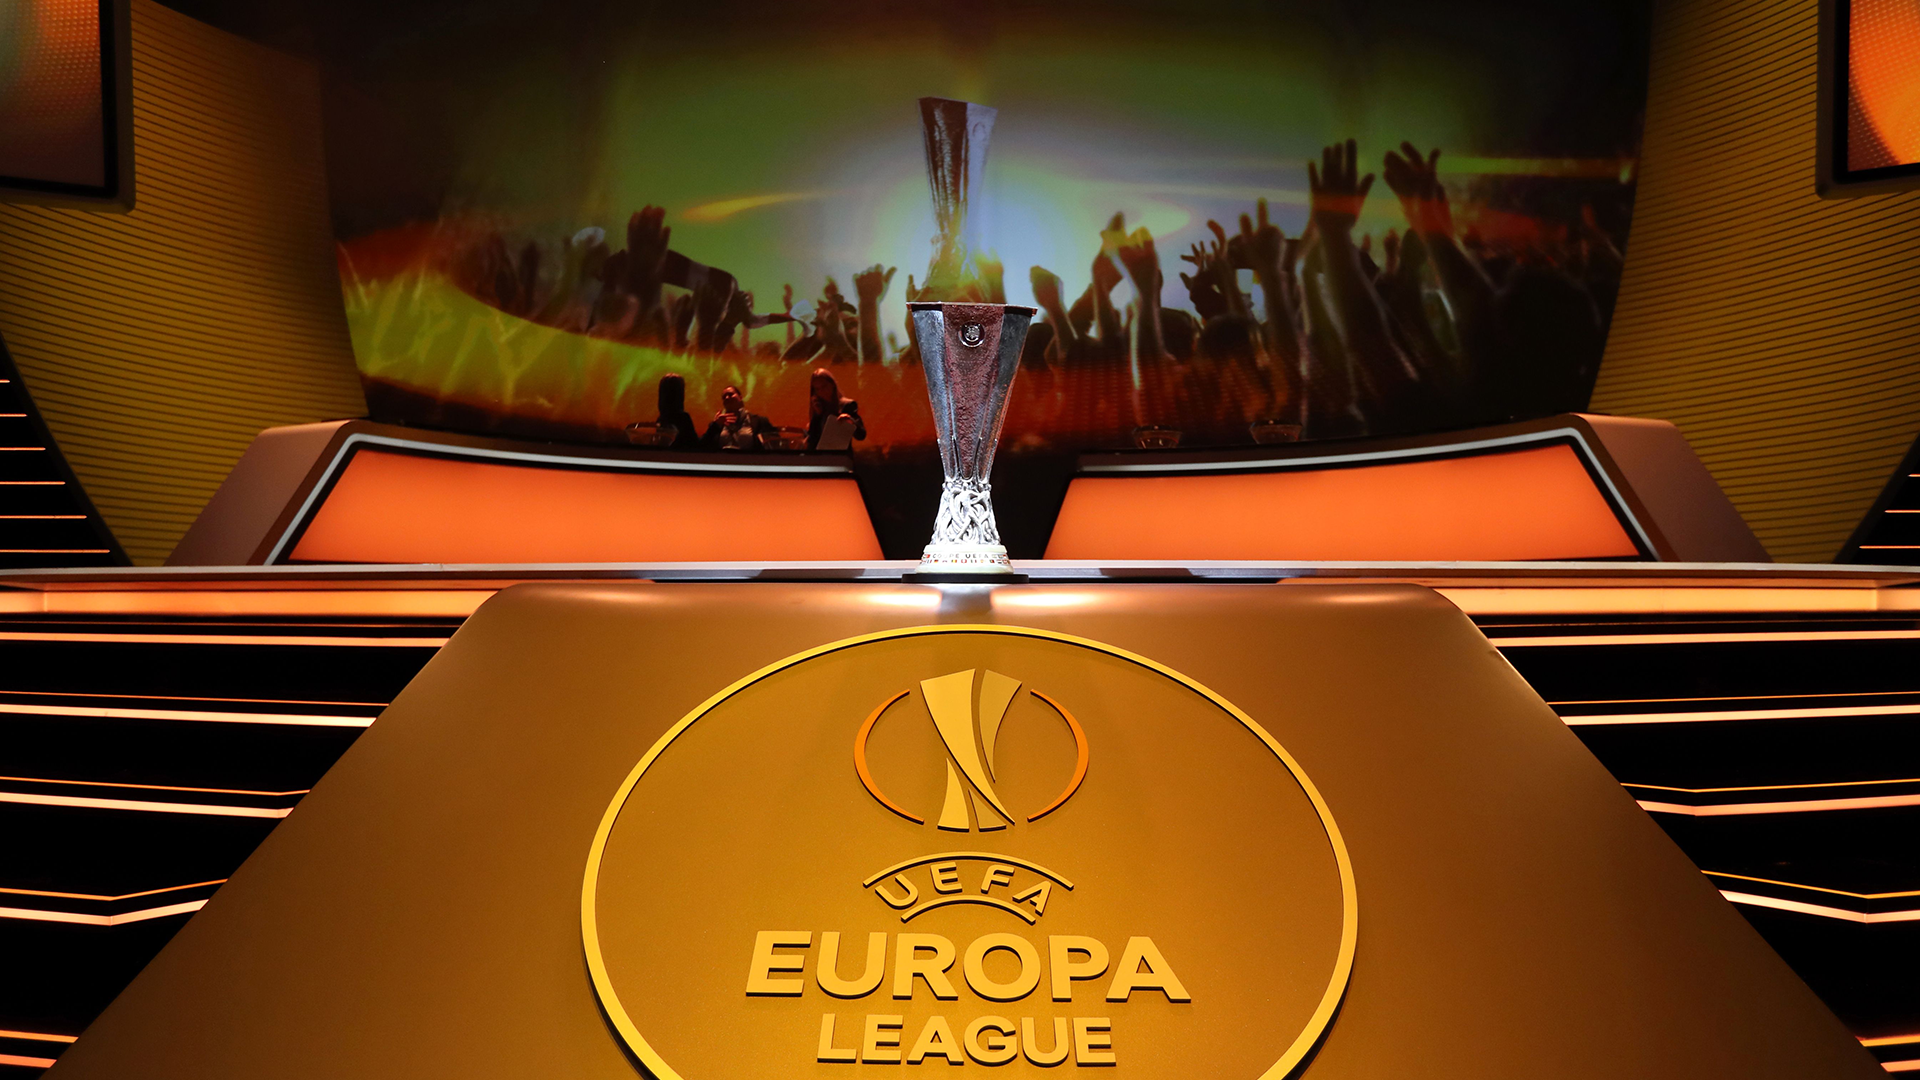 Europa League 2017-18